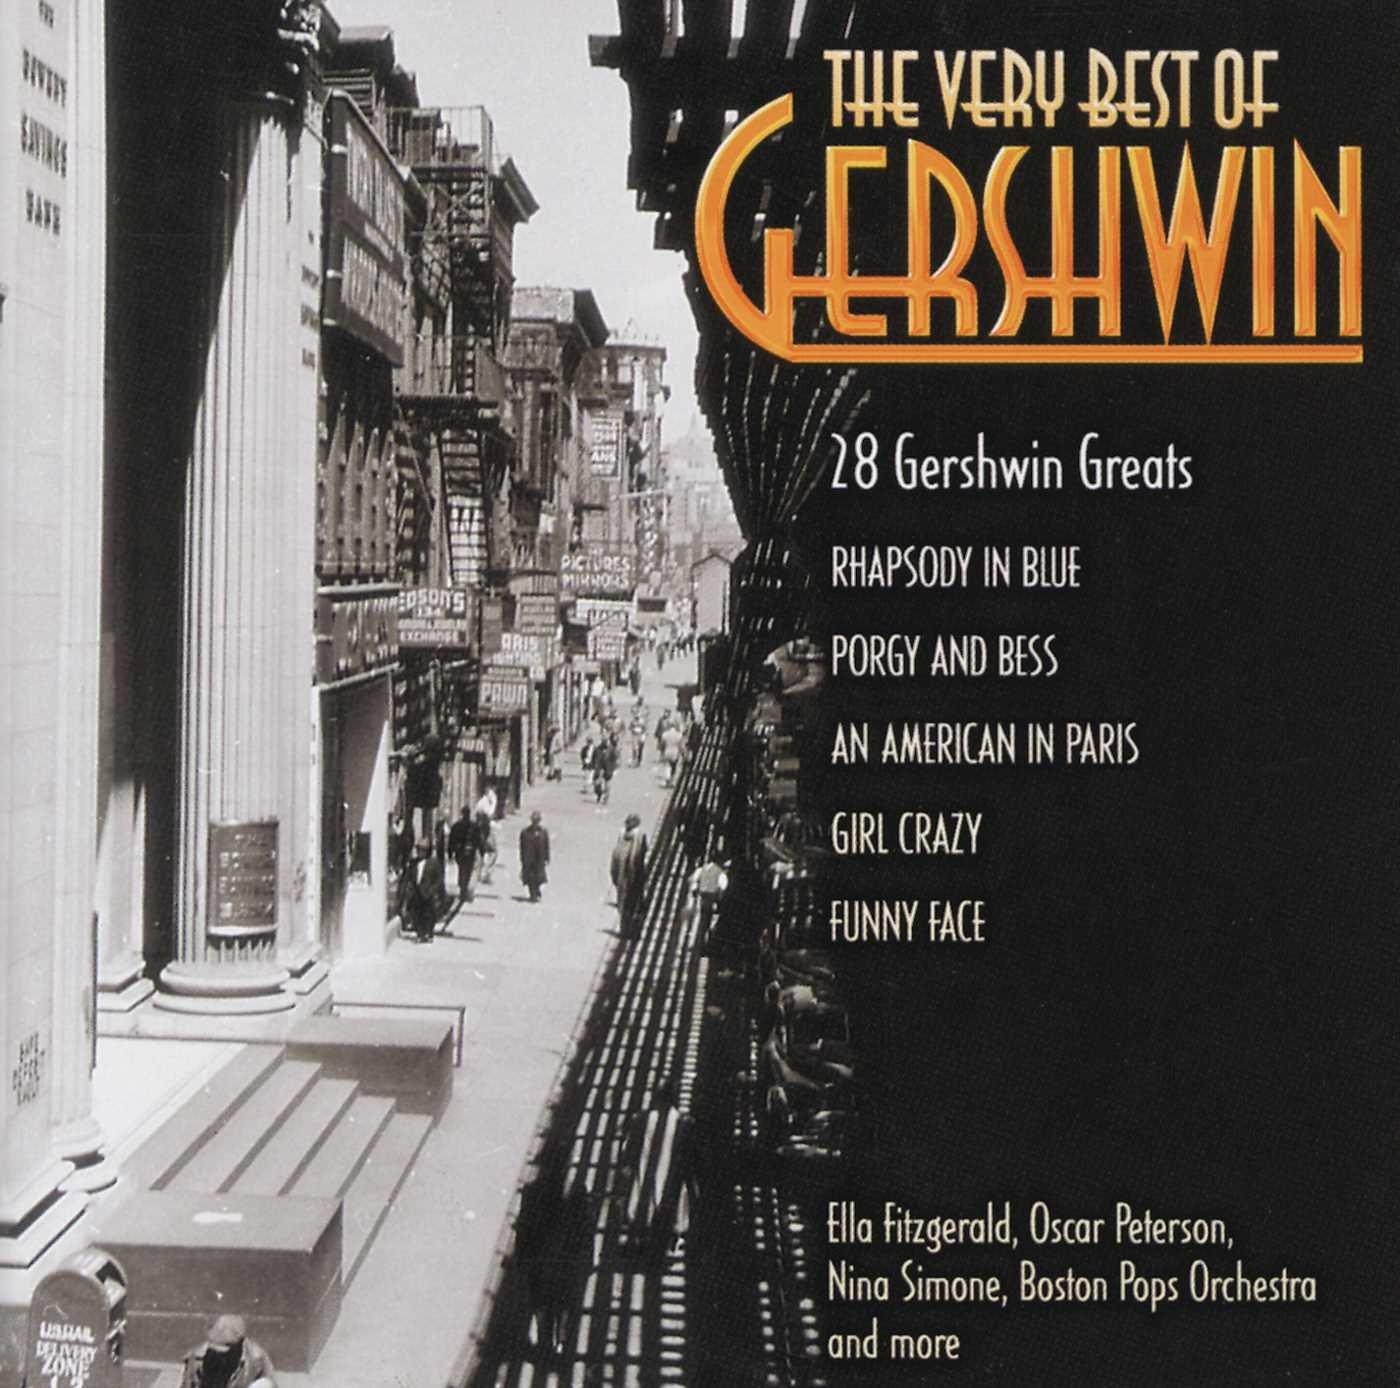 Ultimate Collection Spring new work Gershwin 2 CD Nashville-Davidson Mall